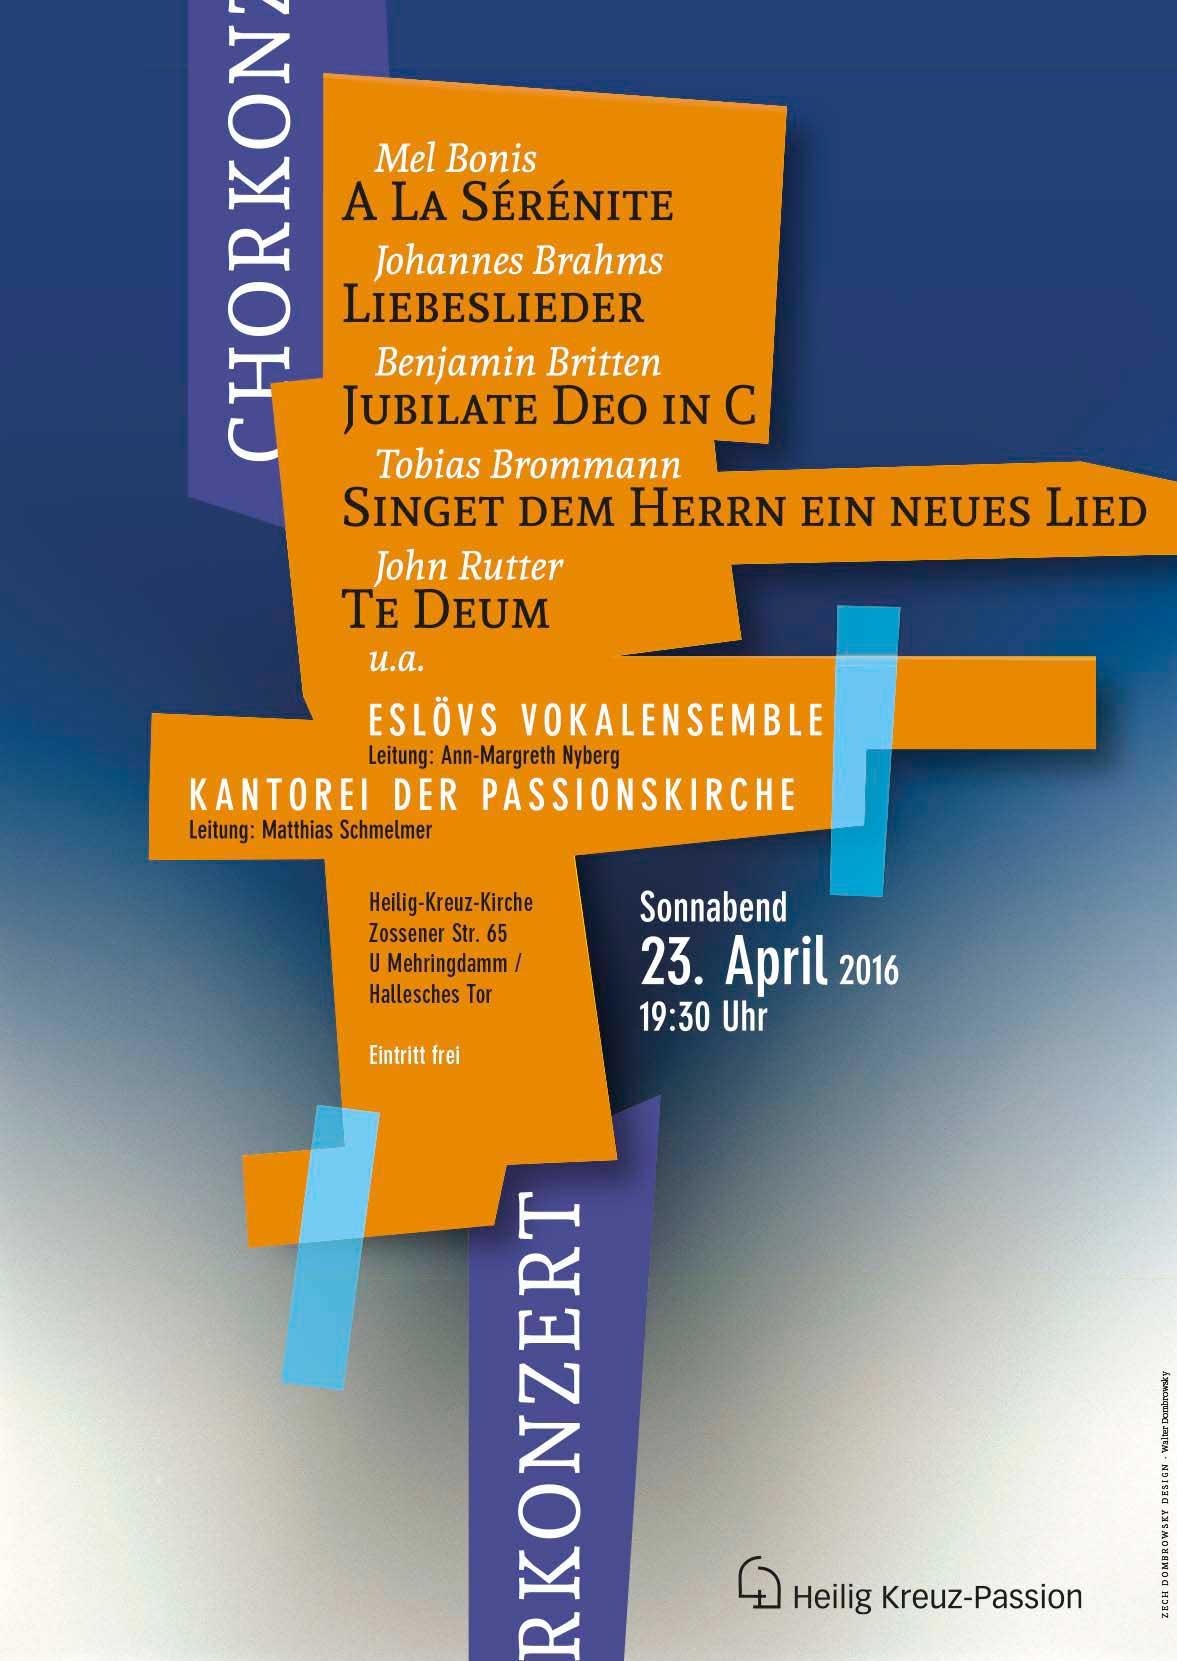 Johann Sebastian Bach, Steve Dobrogosz, Kantorei der Passionskirche, Berlin-Kreuzberg, Plakatgestaltung Zech Dombrowsky Design